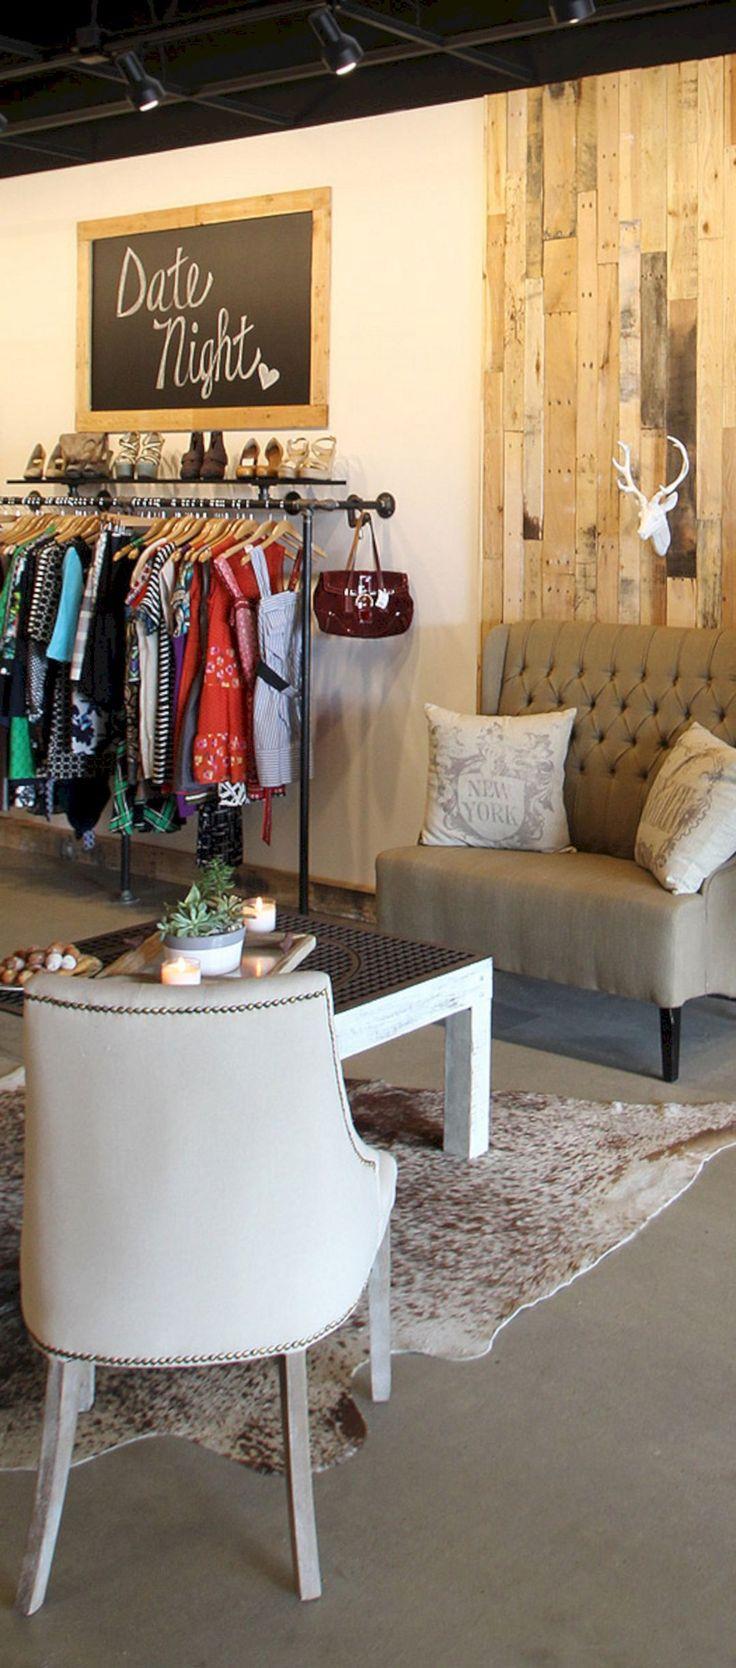 best 25 boutique interior design ideas on pinterest boutique store design boutique design. Black Bedroom Furniture Sets. Home Design Ideas